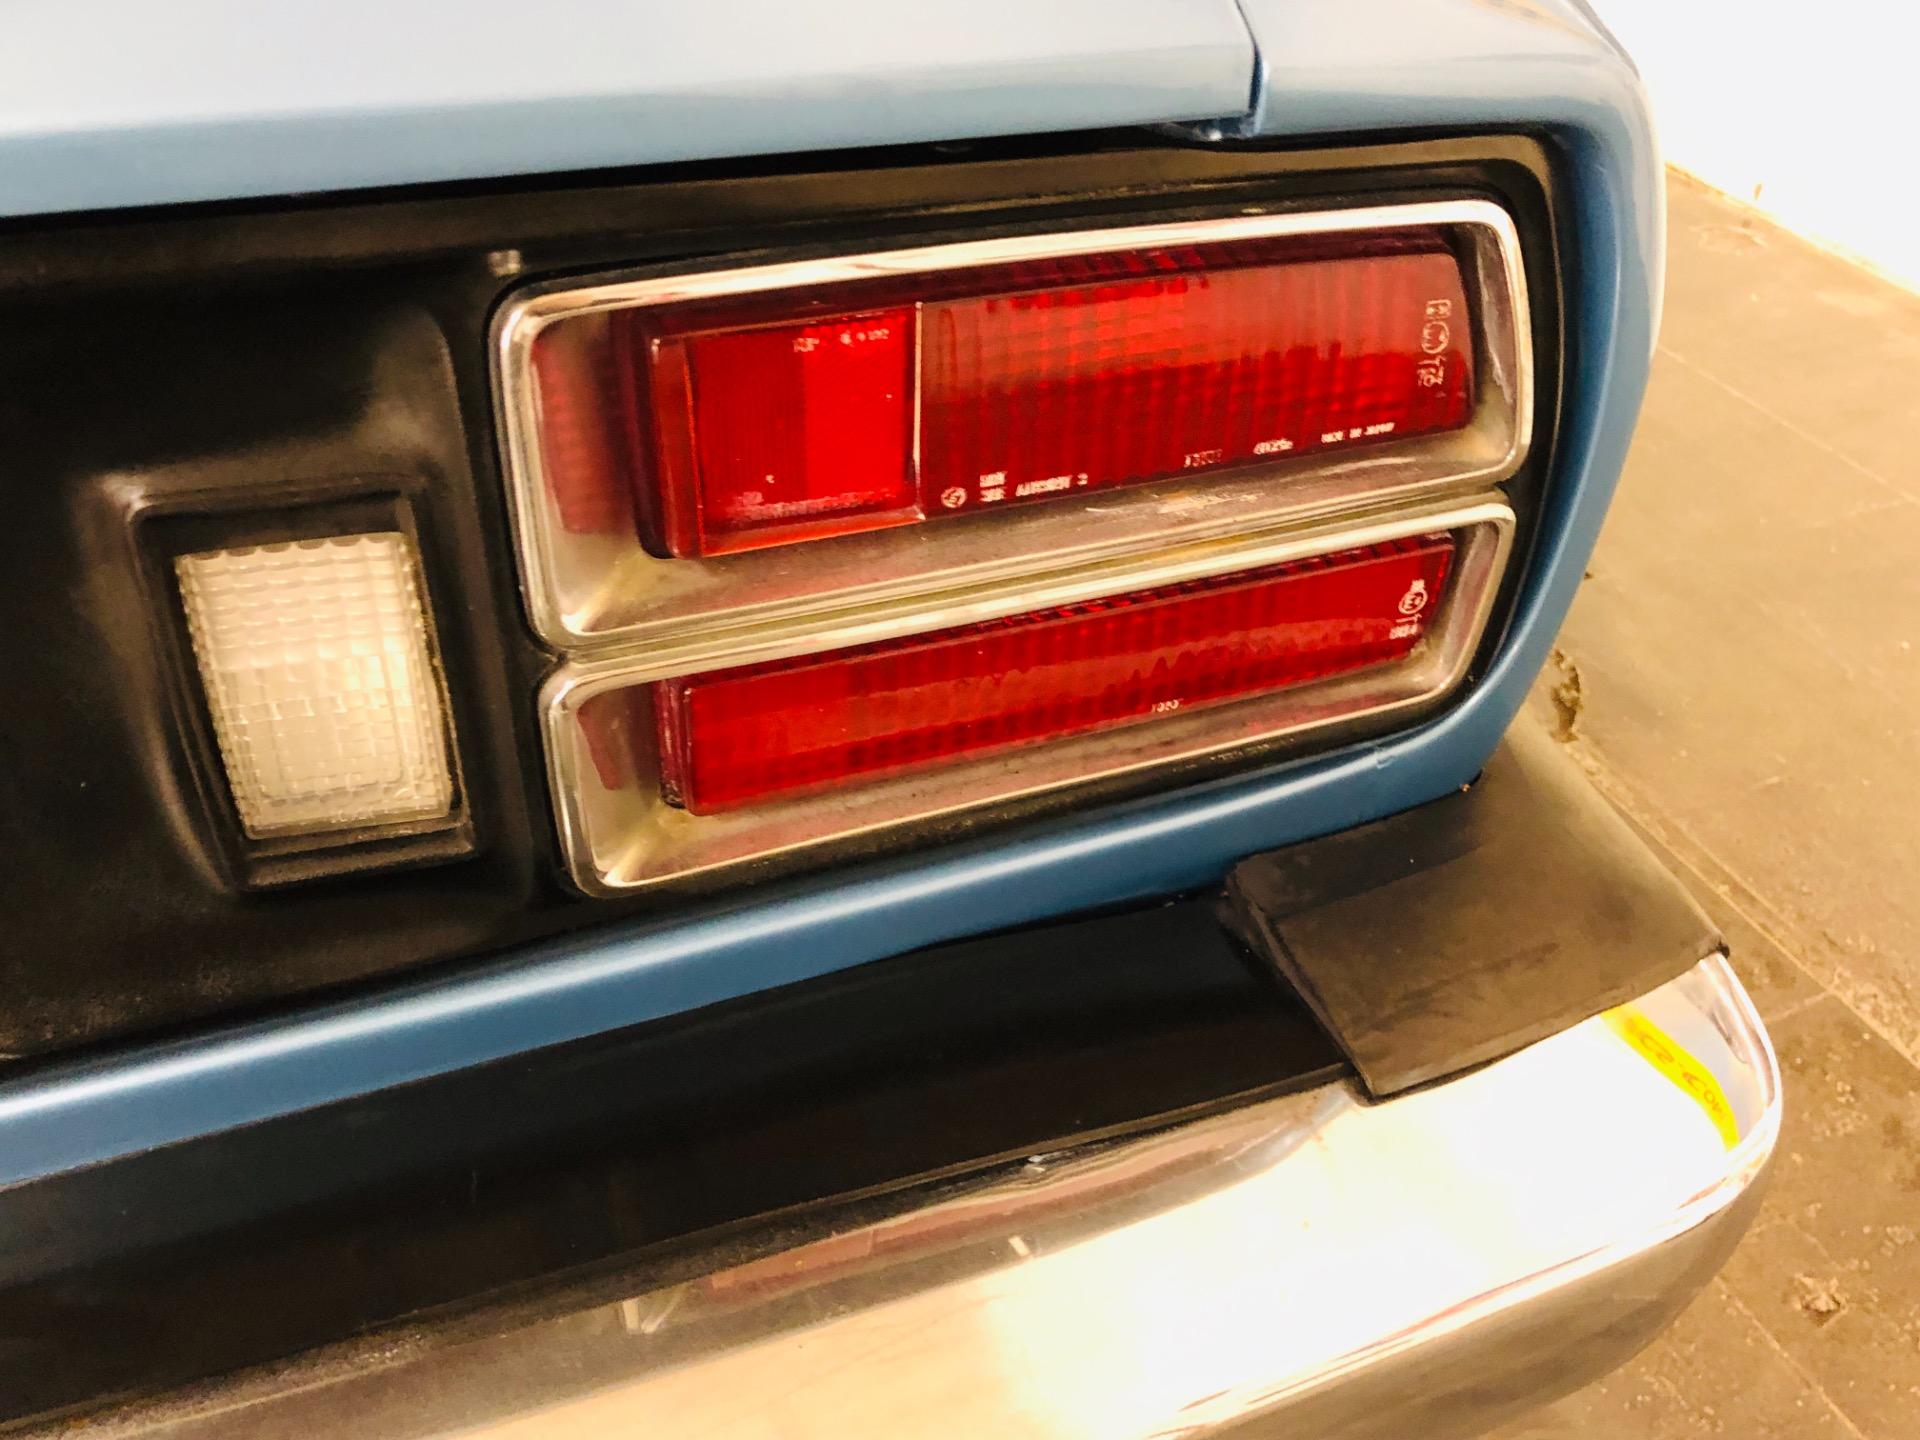 Used 1976 Datsun 280Z -CLEAN CLASSIC IMPORT-VIDEO | Mundelein, IL